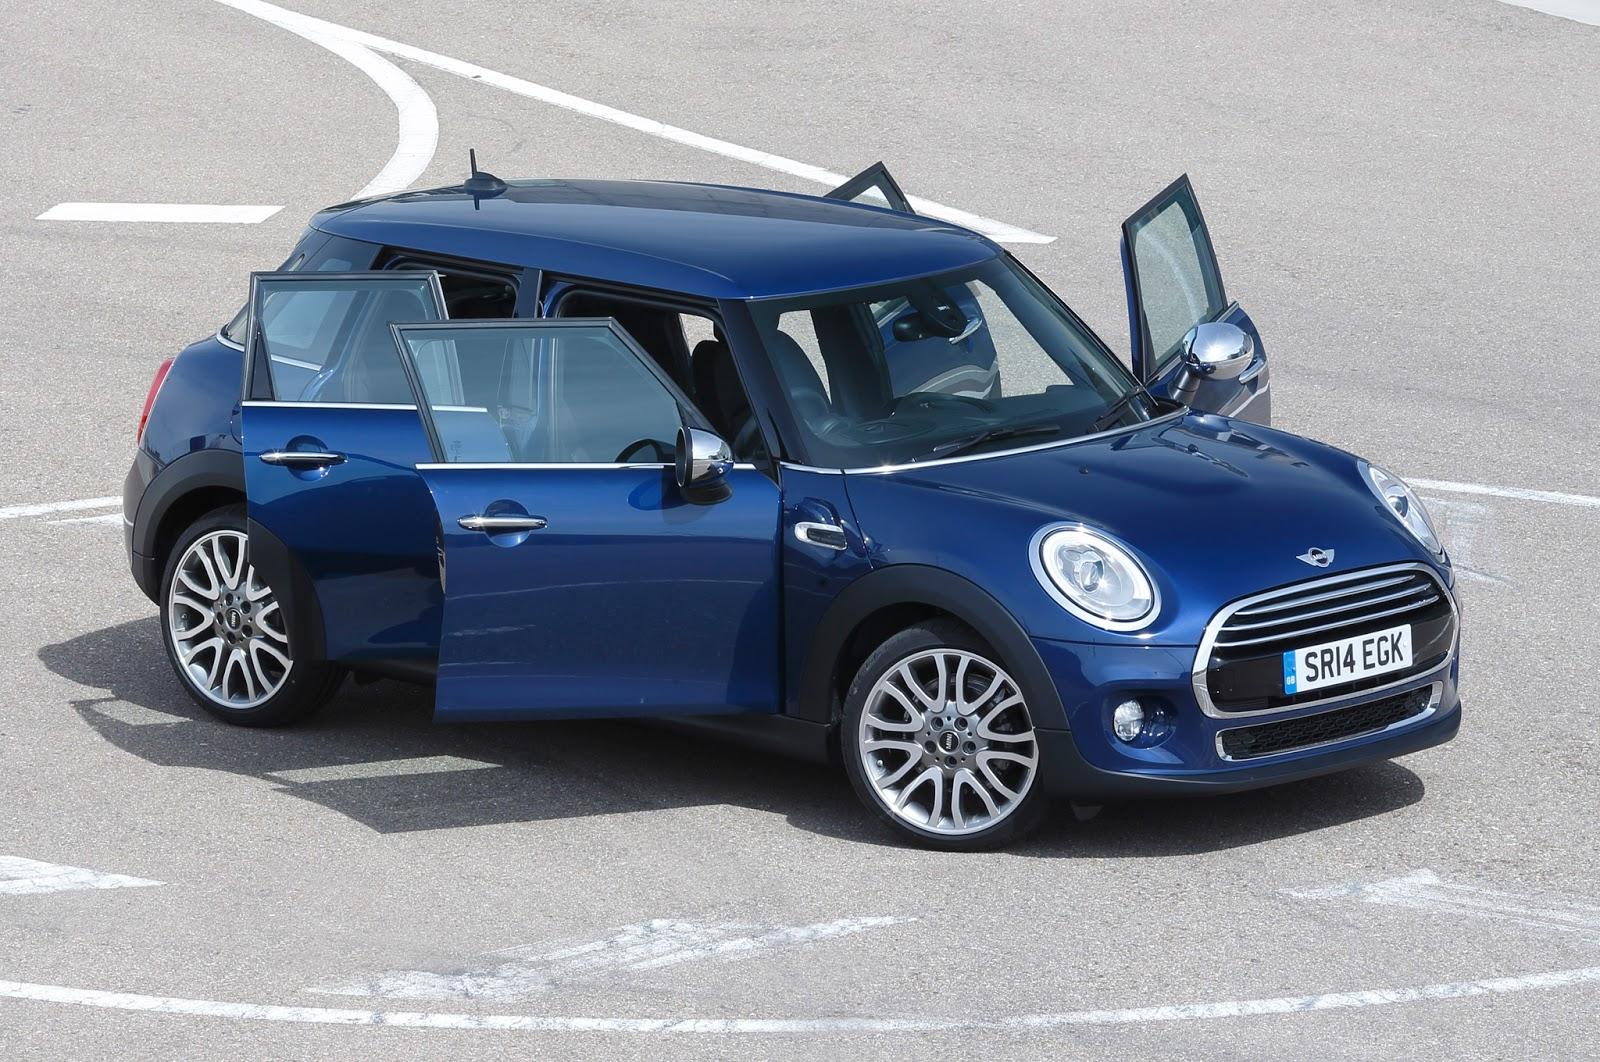 cars discourse 2015 mini cooper s hardtop 4 door. Black Bedroom Furniture Sets. Home Design Ideas